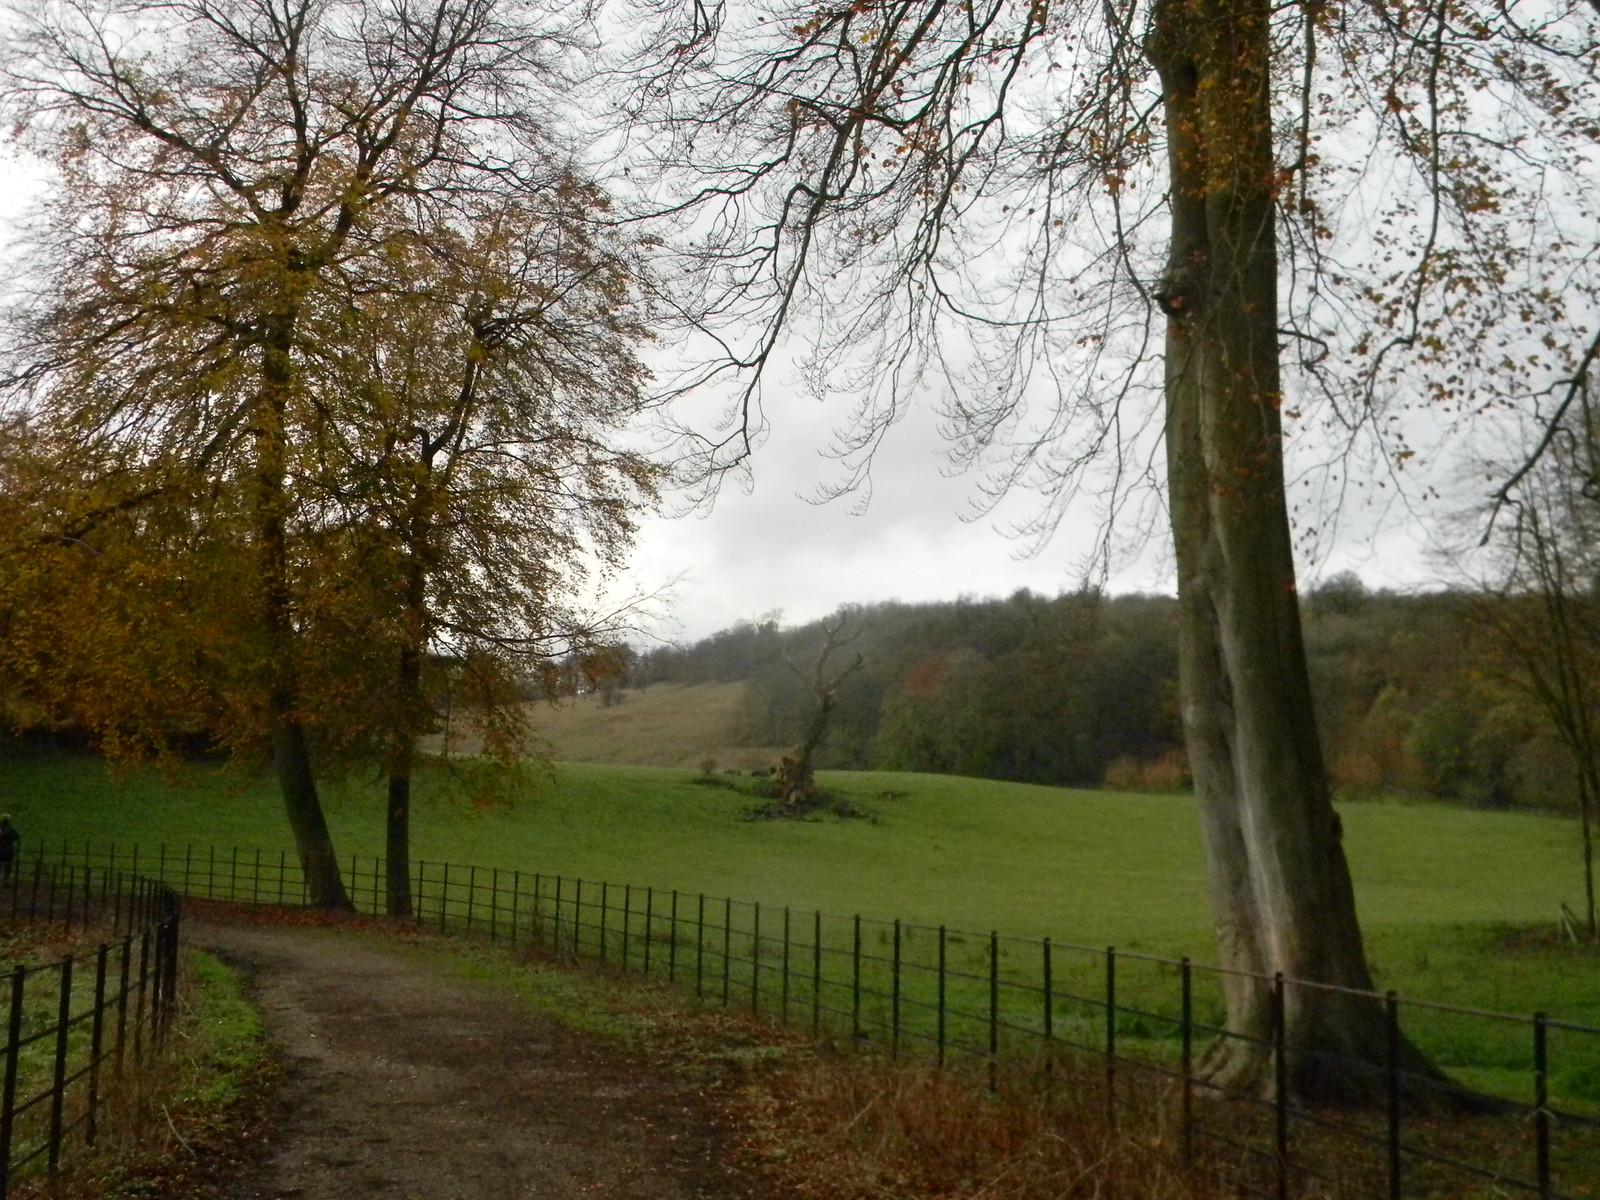 Gatton Park Merstham to Tattenham Corner